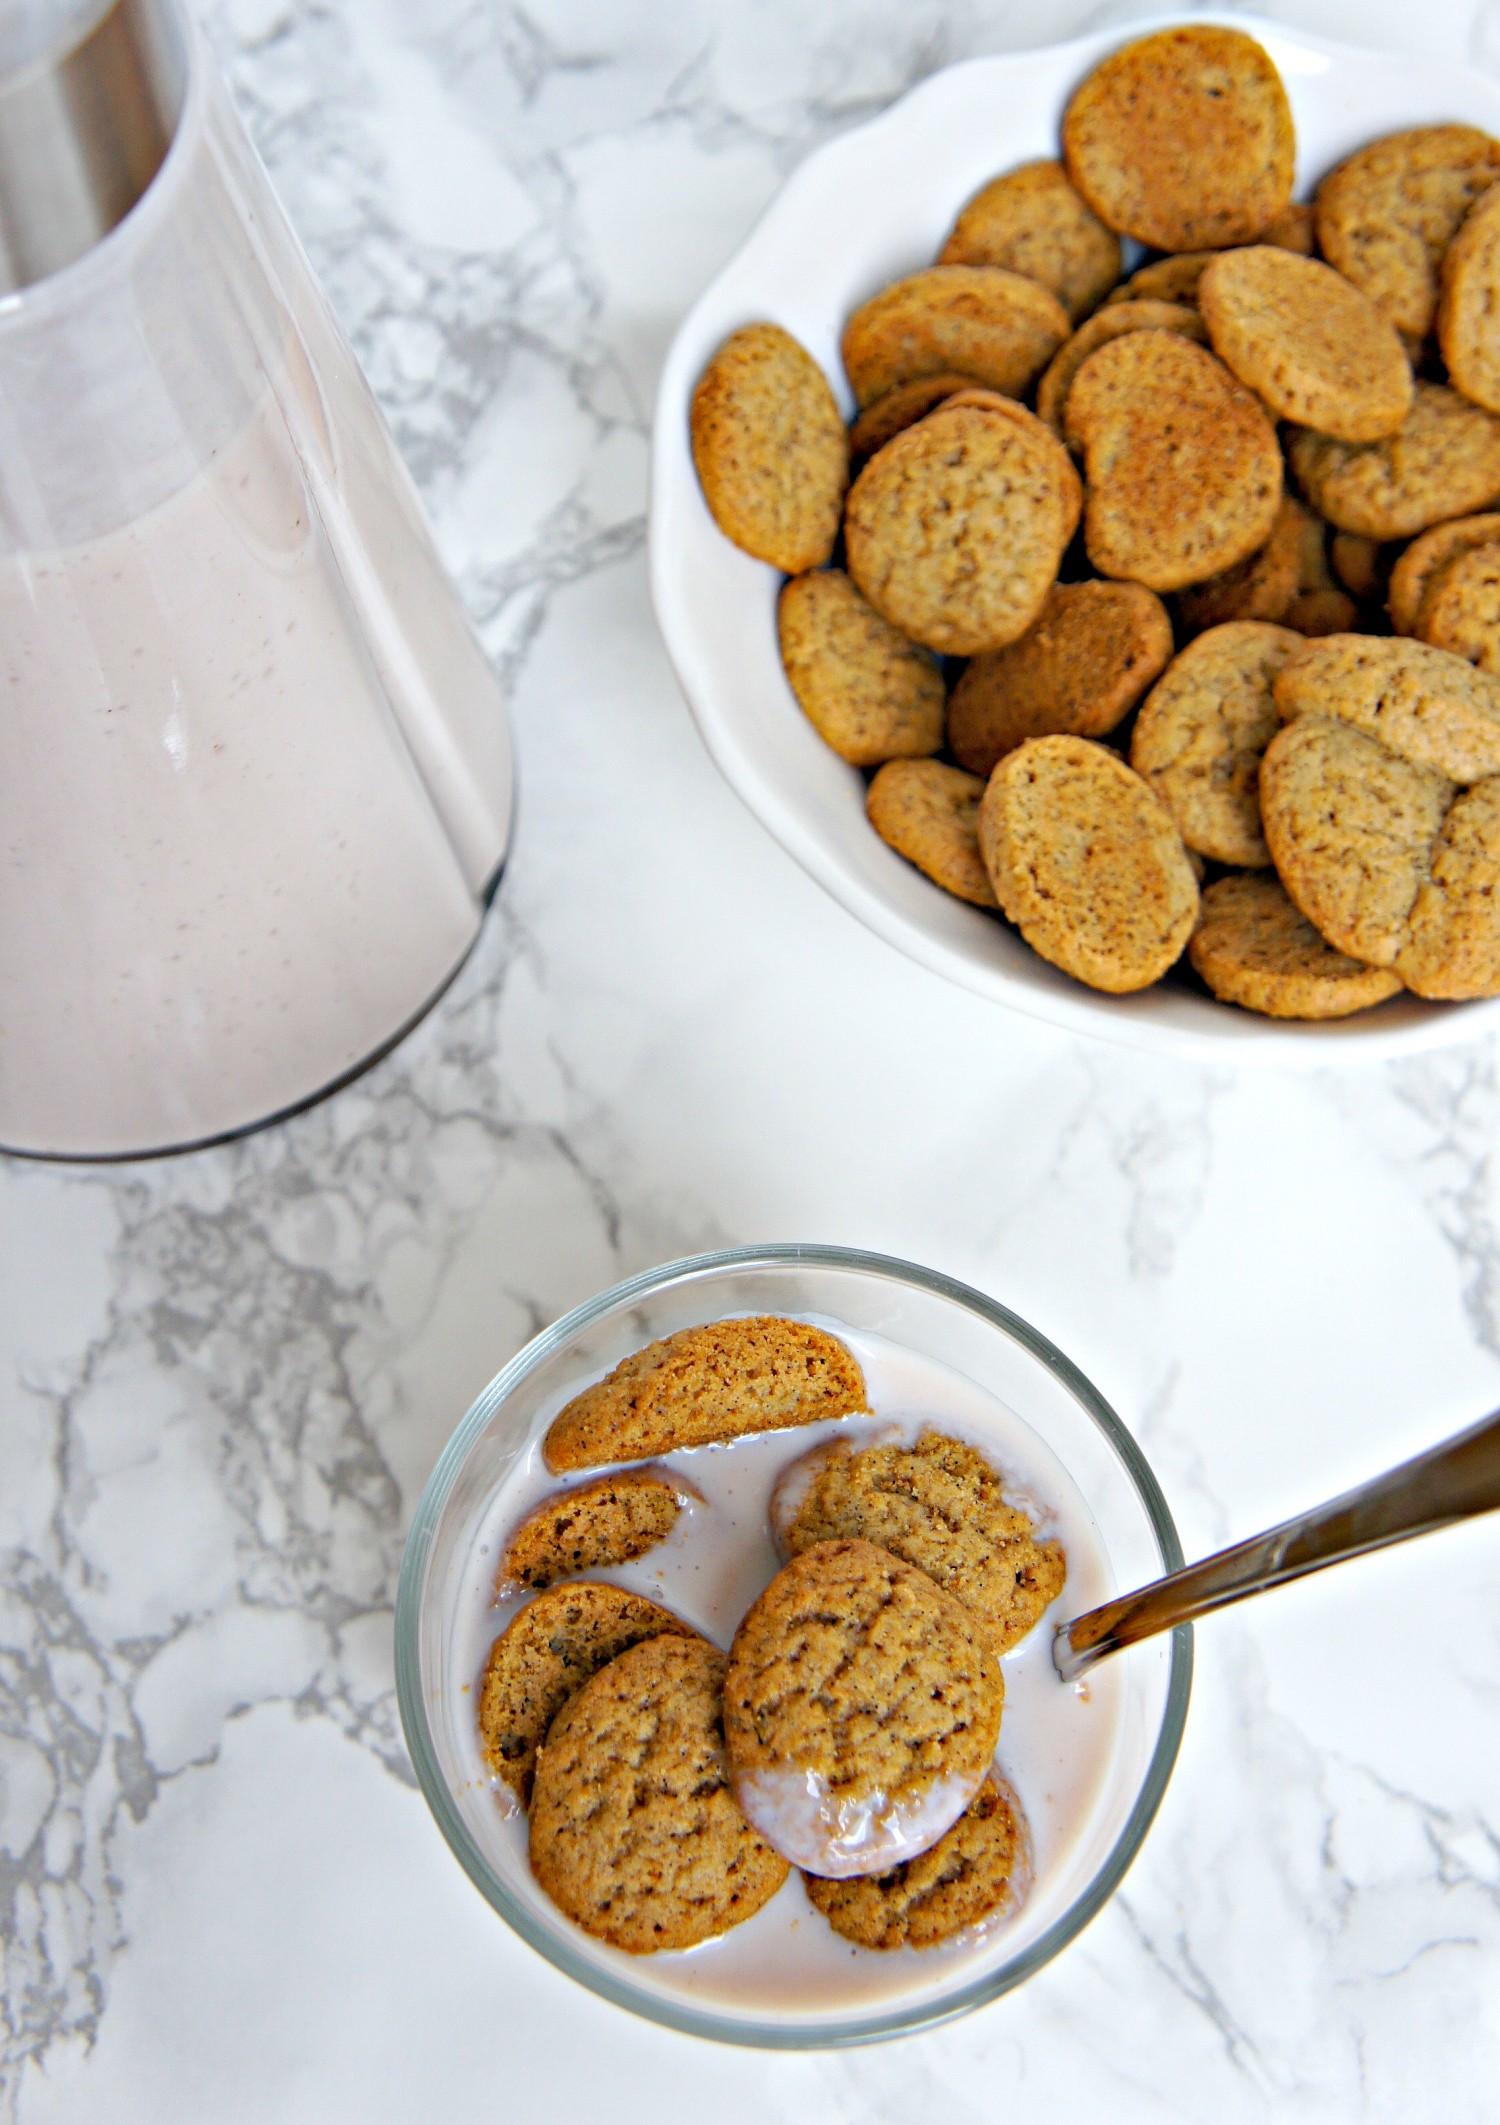 De bedste glutenfrie kammerjunker og den bedste veganske koldskål - Cathrineyoga - 8